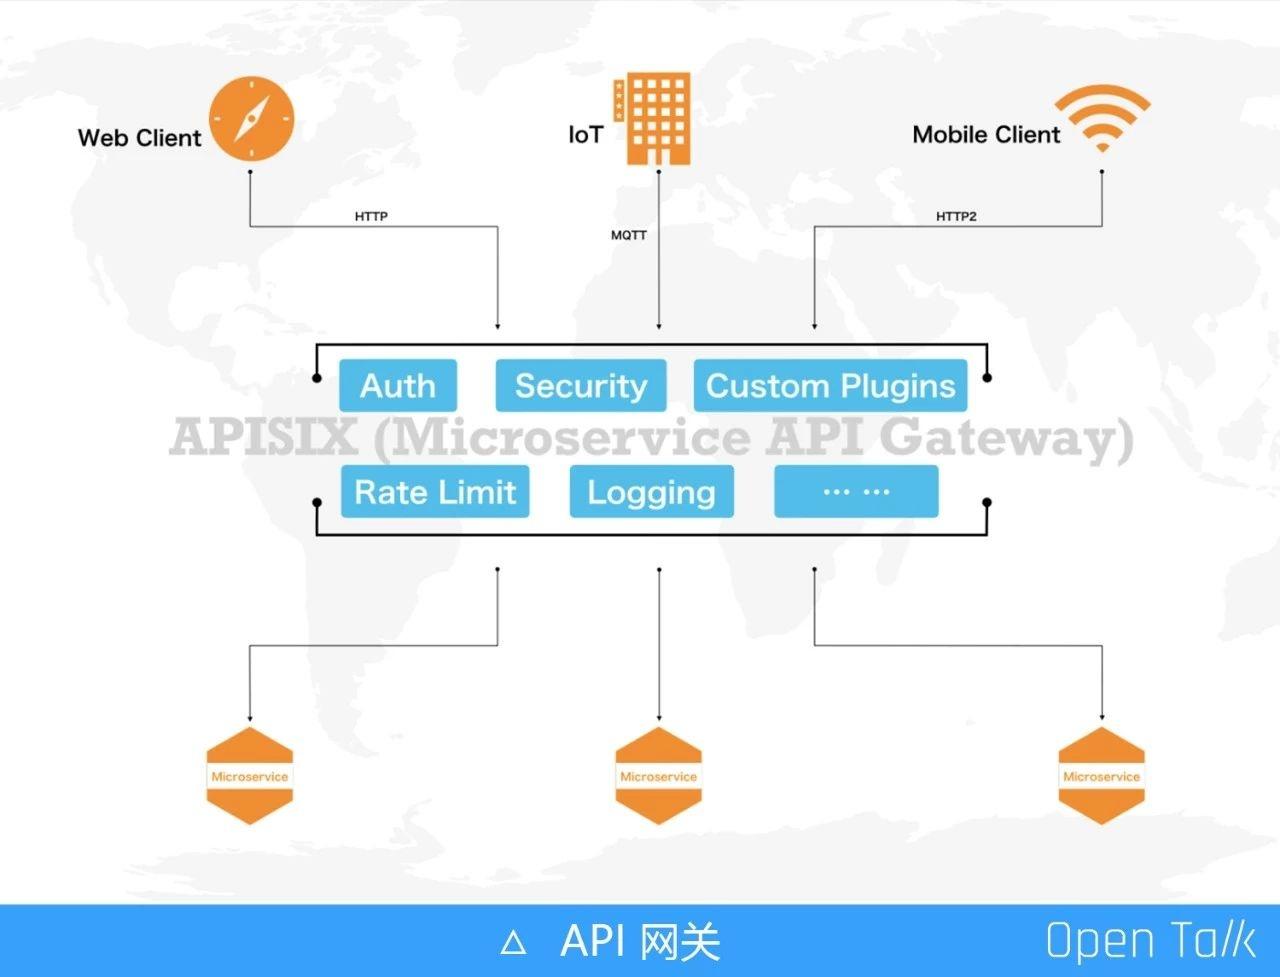 再谈 APISIX 高性能实践